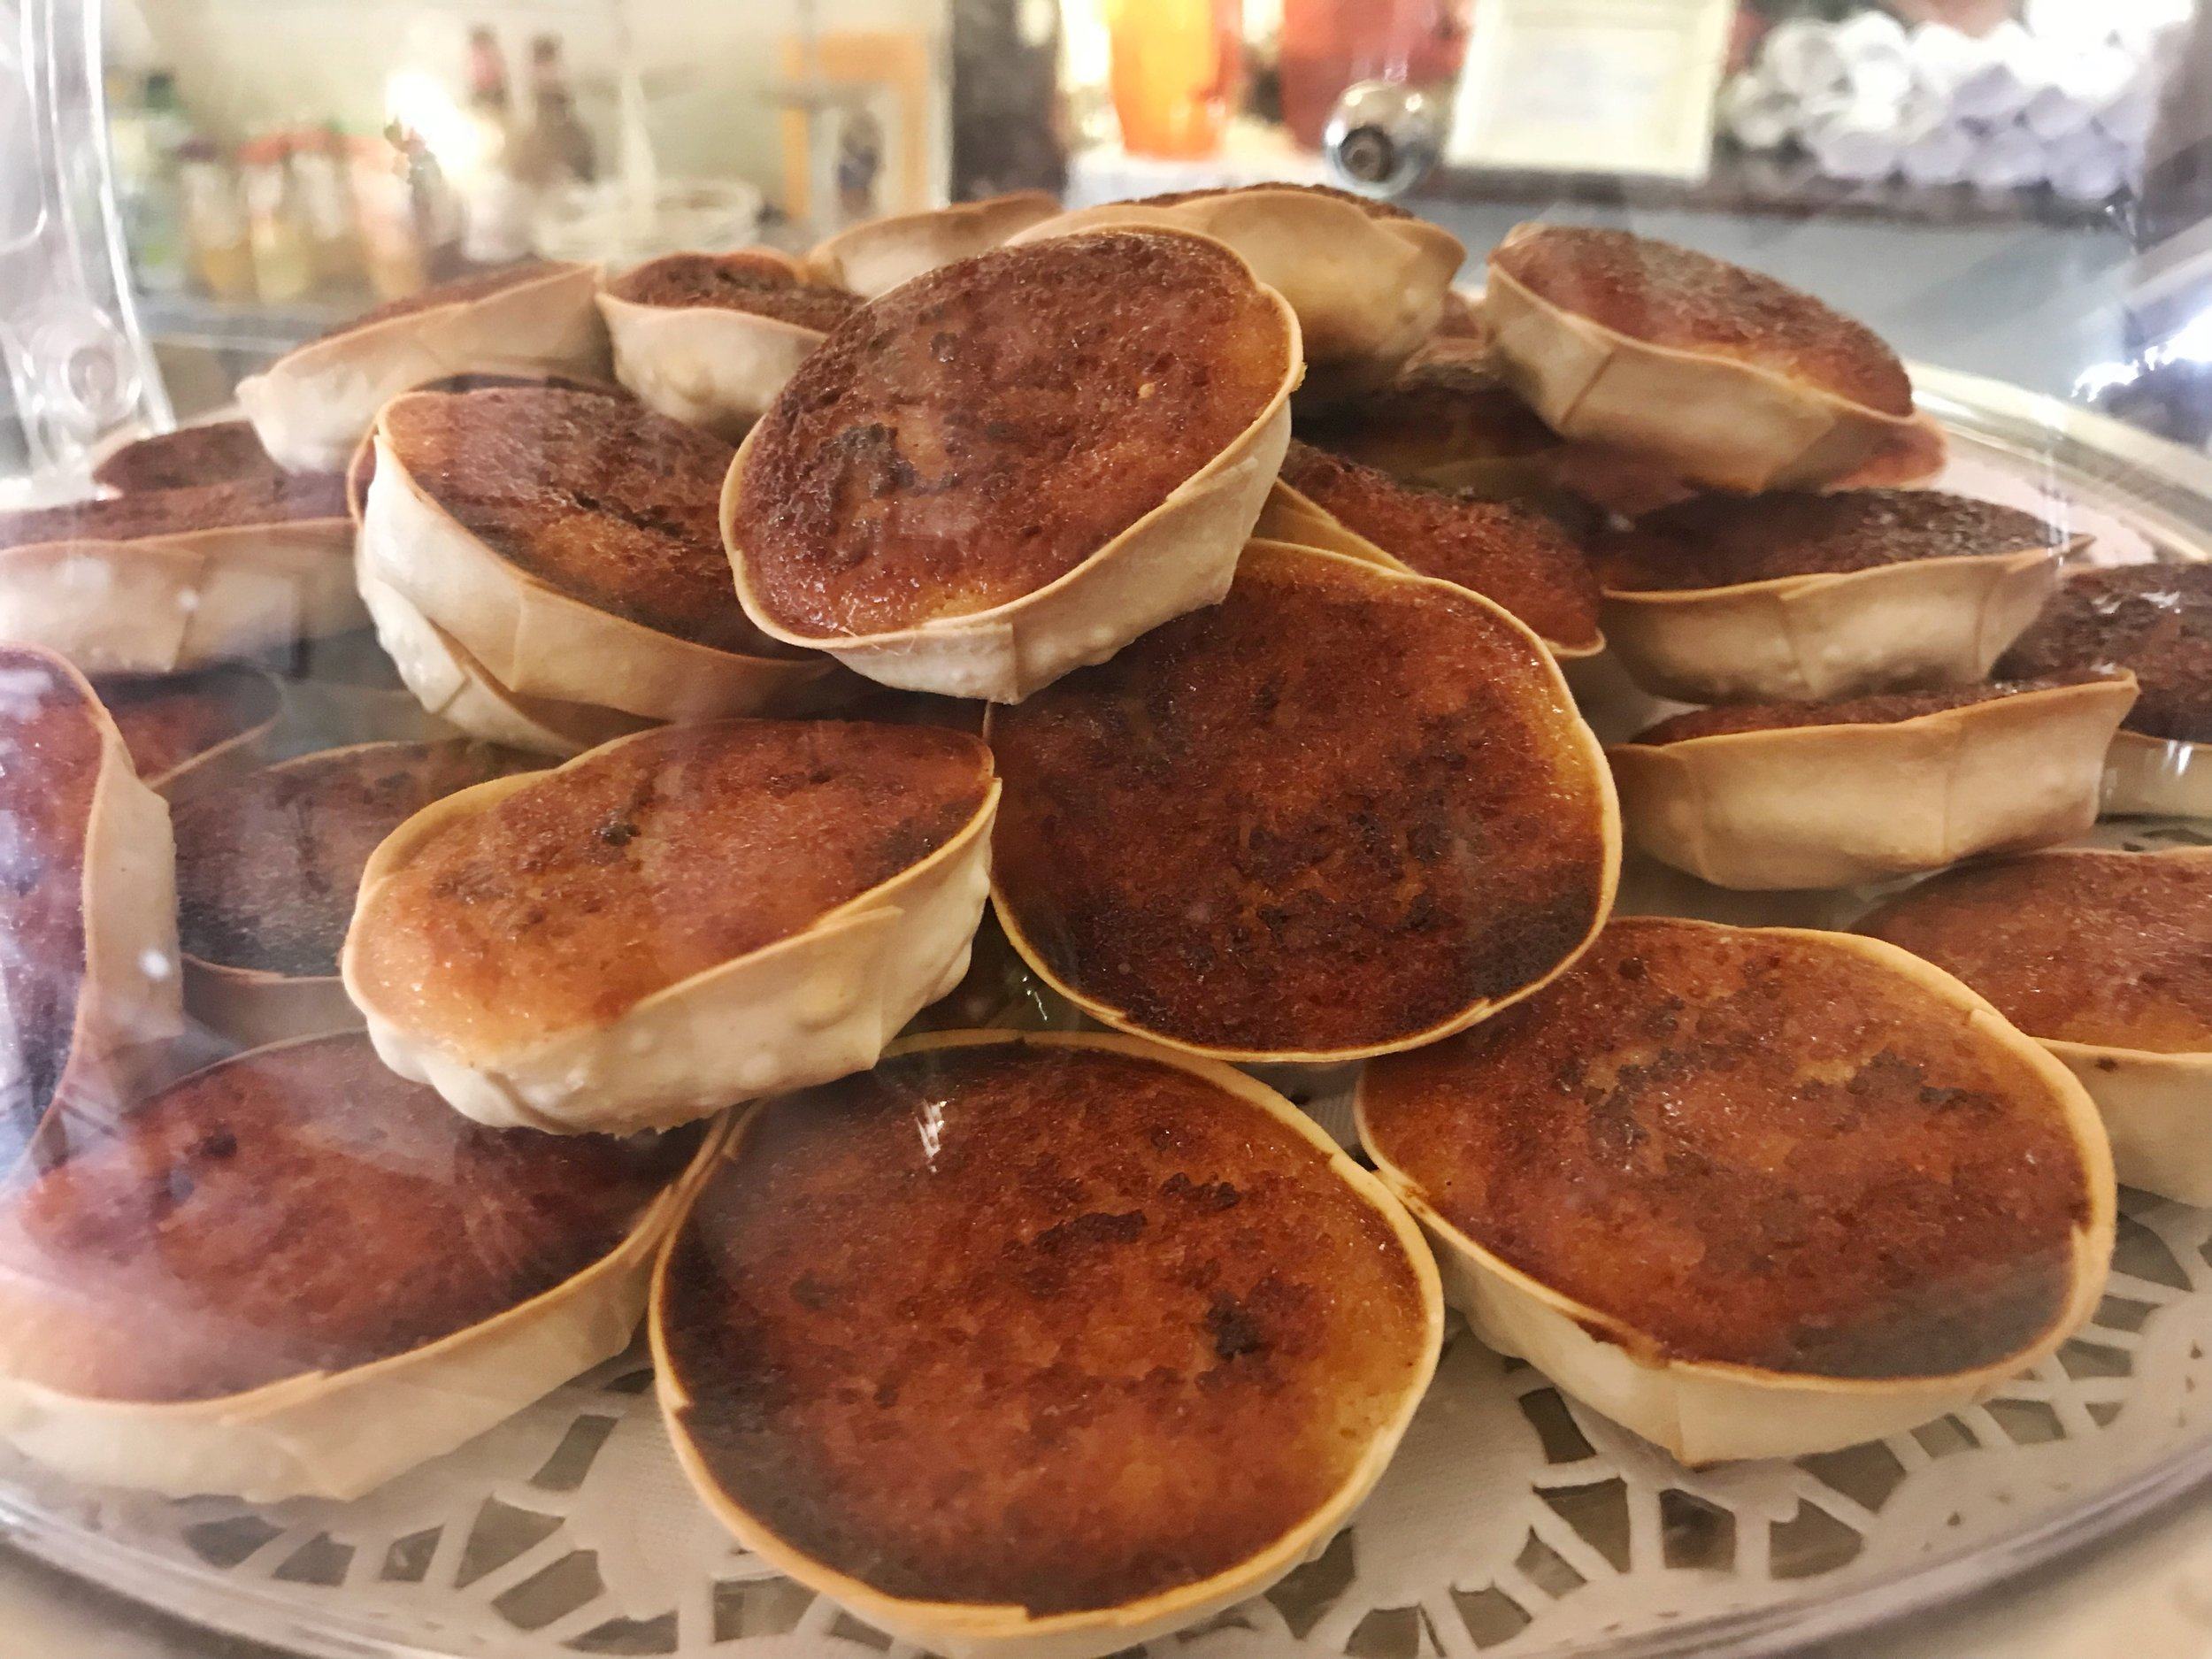 24hourkitchen-travel-guide-to-portuguese-pastries-pastelaria-lisbon-portugal-queijadas